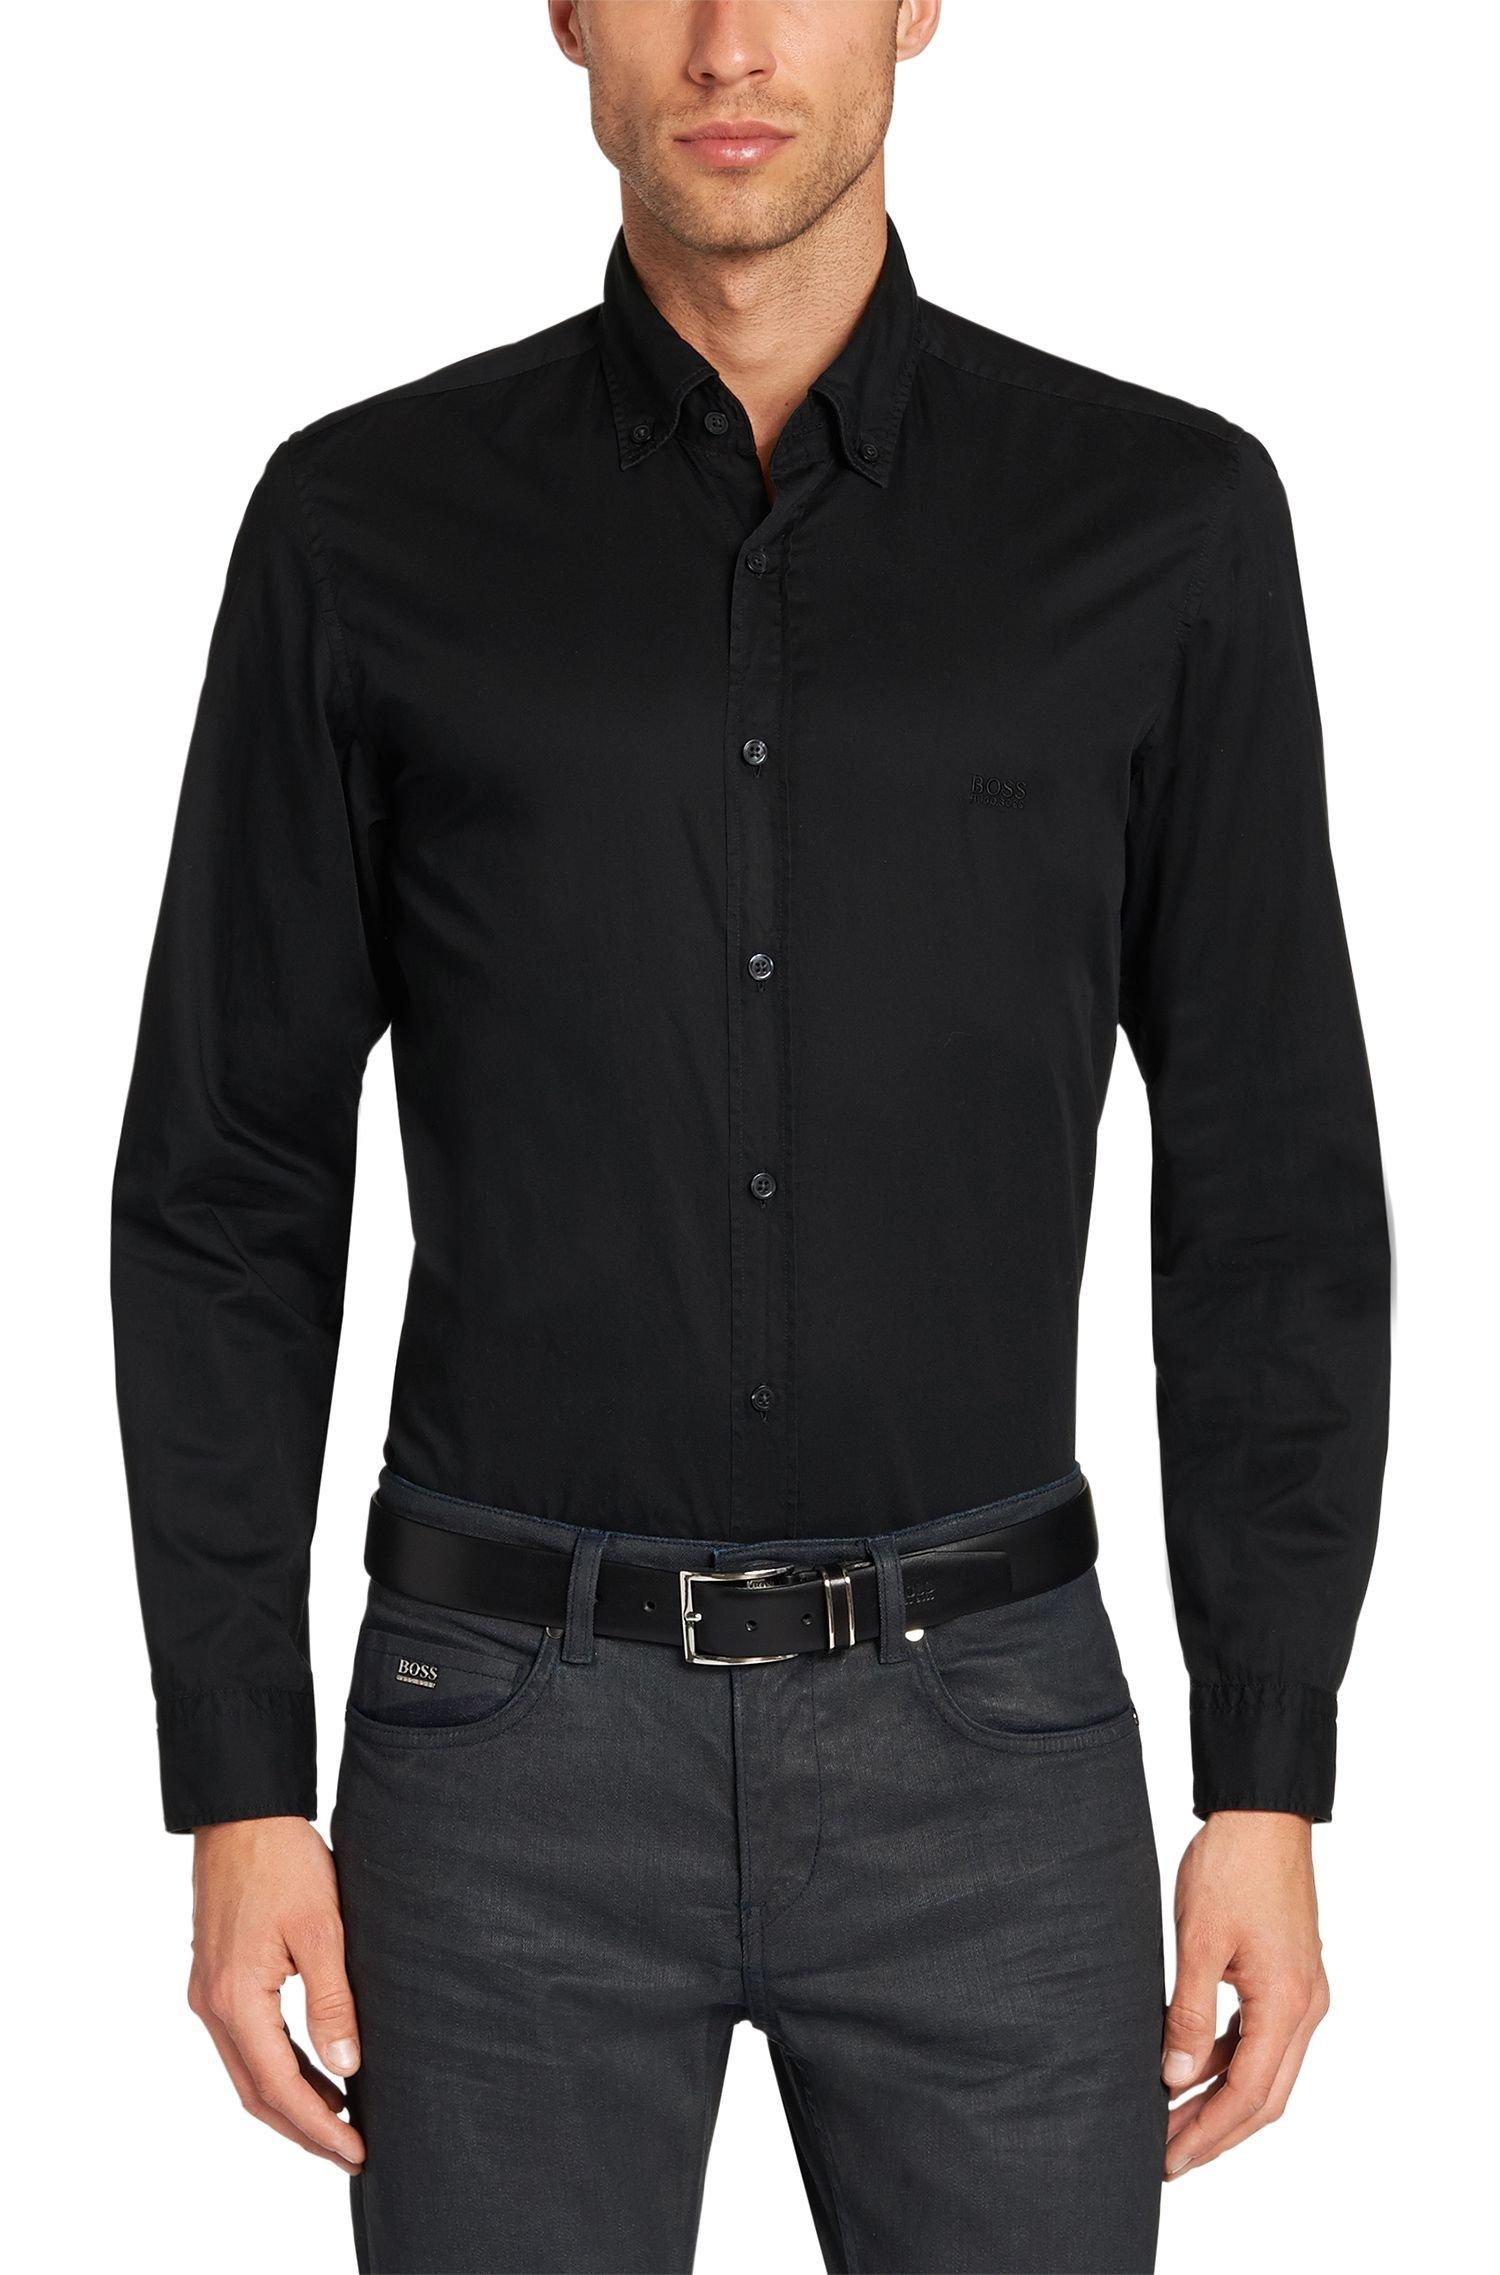 Hugo Boss Leonard_E Dress Shirt, Black